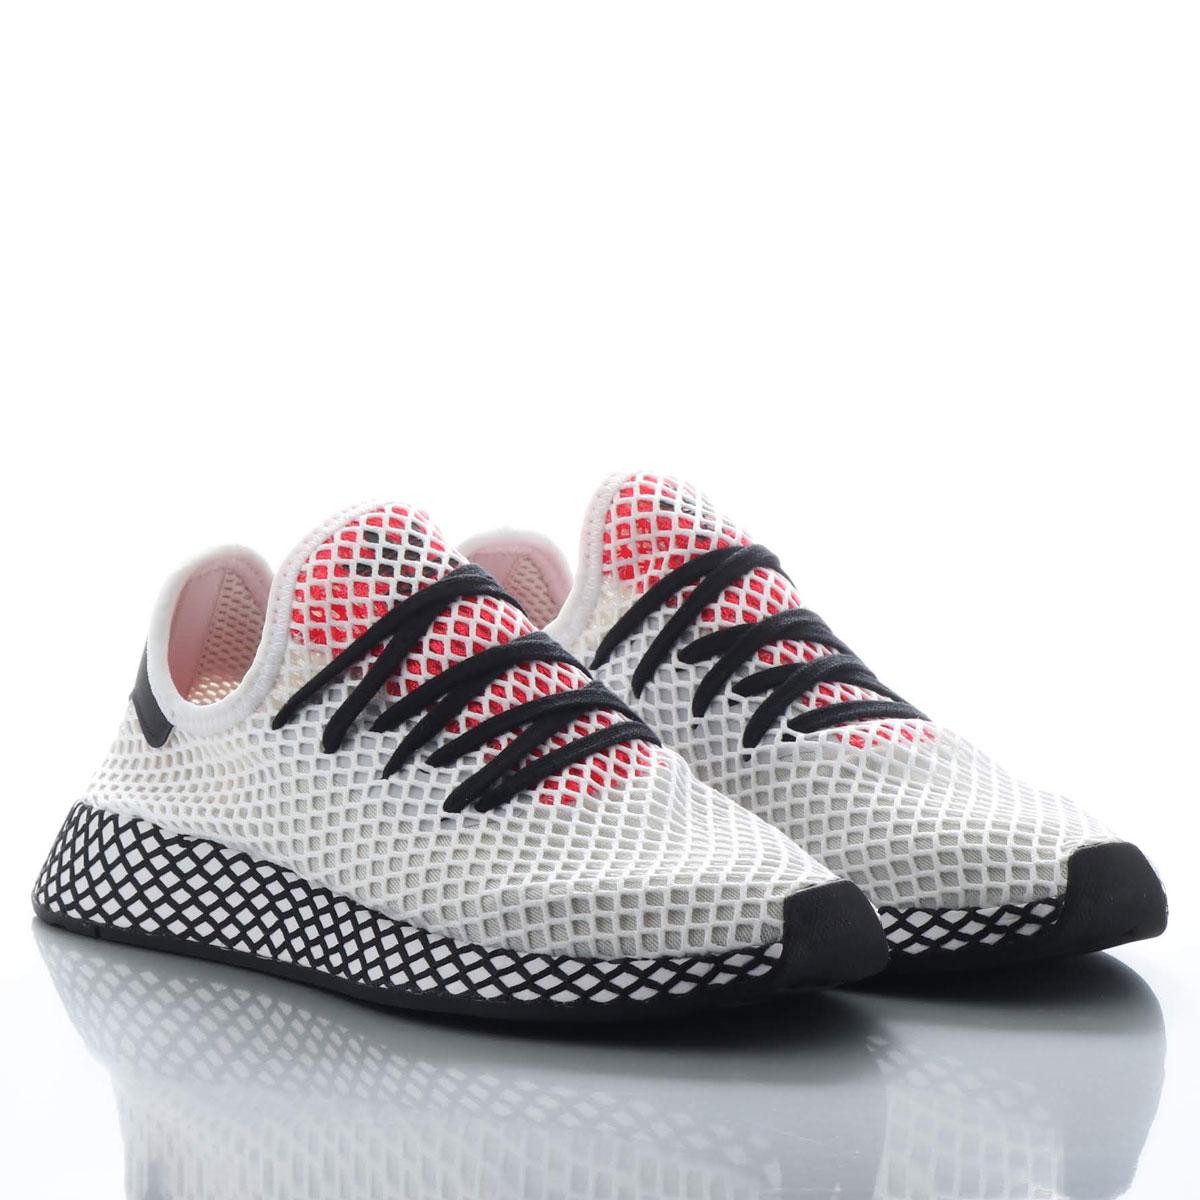 adidas Originals DEERUPT RUNNER(アディダスオリジナルス ディーラプト ランナー)RUNNING WHITE/CORE BLACK/SHOCK RED【メンズ レディース スニーカー】19SS-I